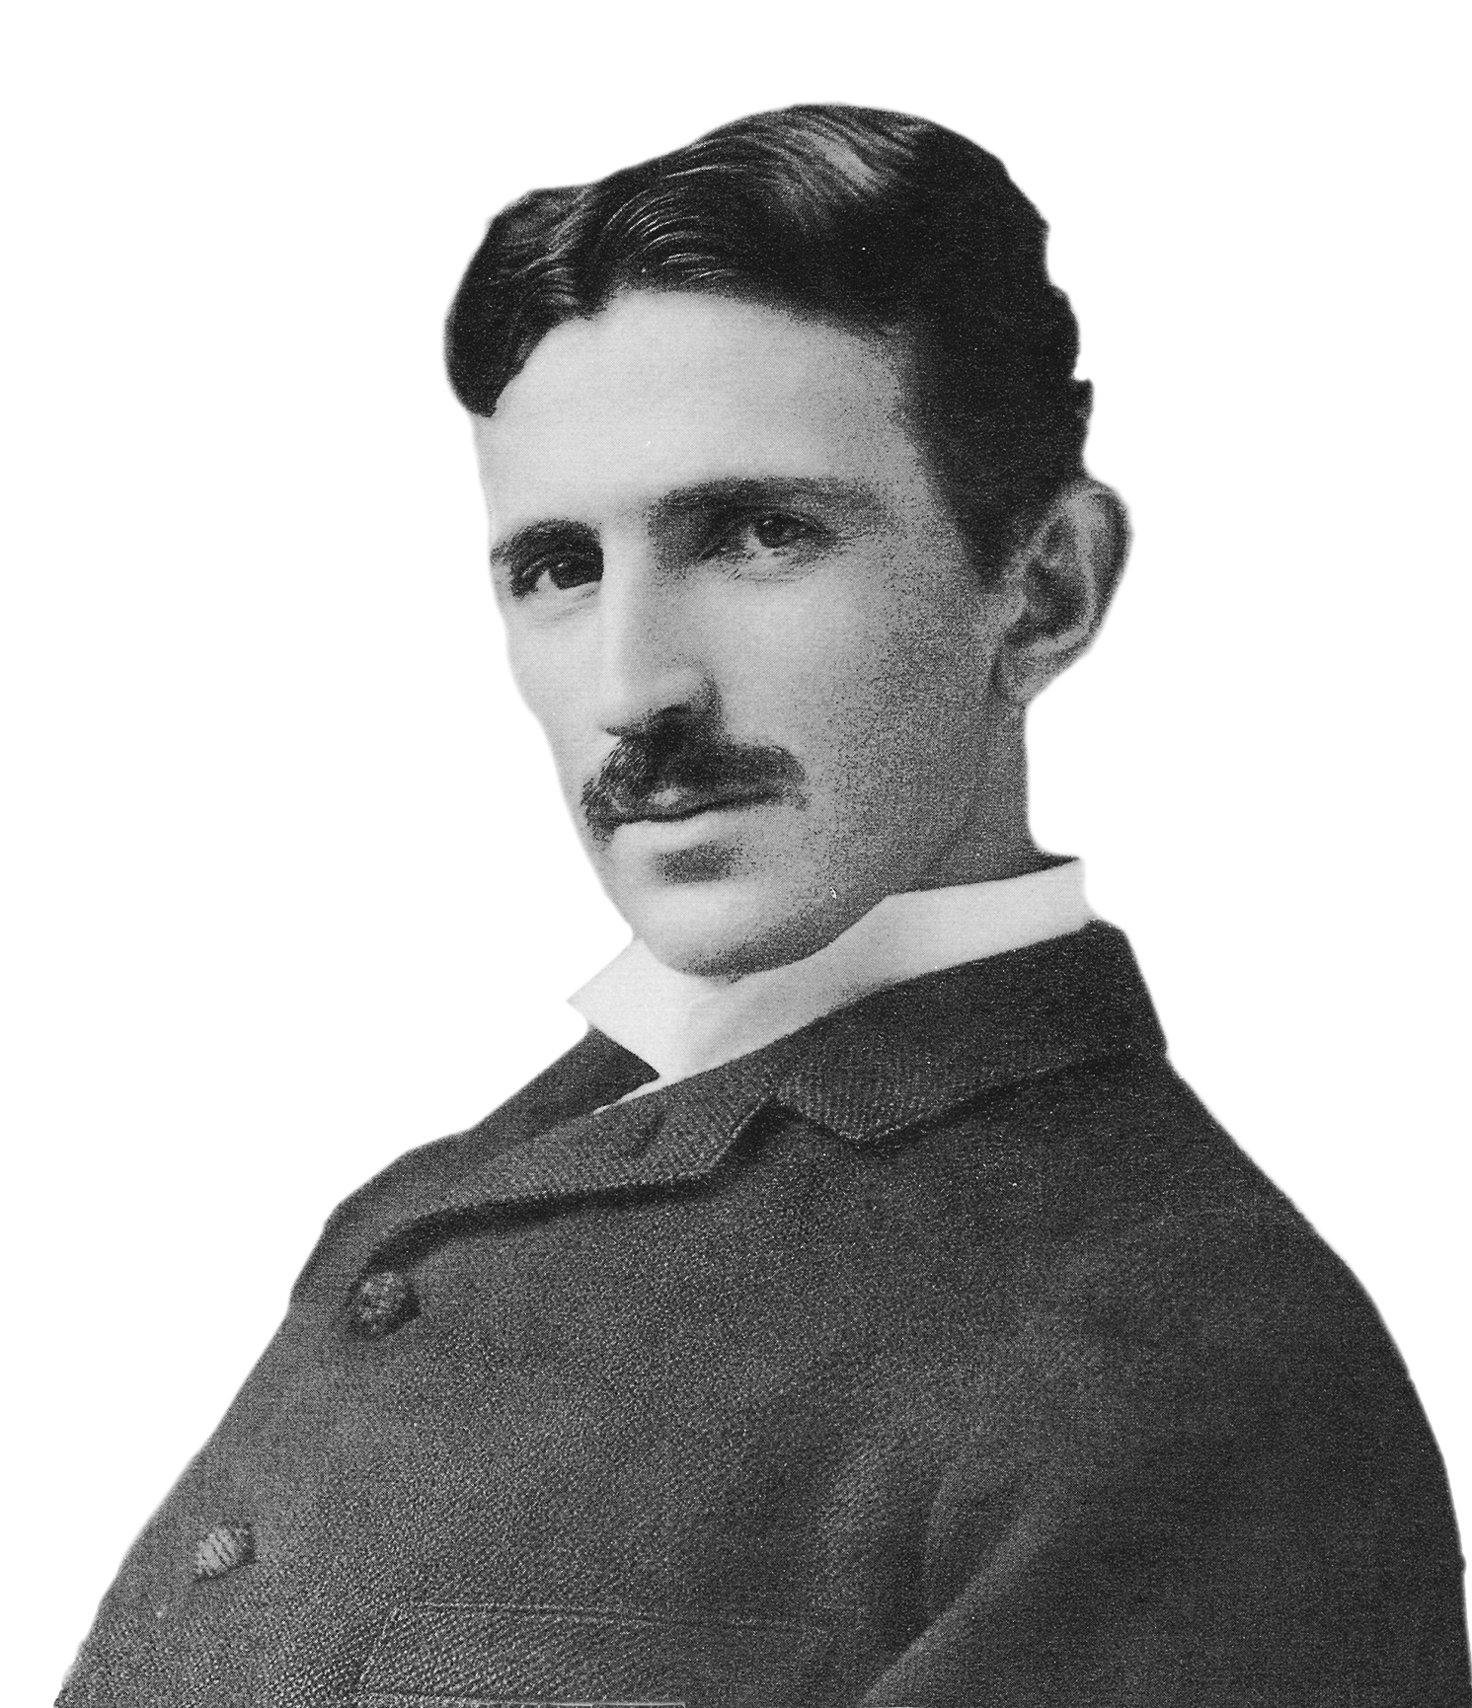 Nikola Tesla Wallpapers 35 Wallpapers: Nikola Tesla Wallpaper HD